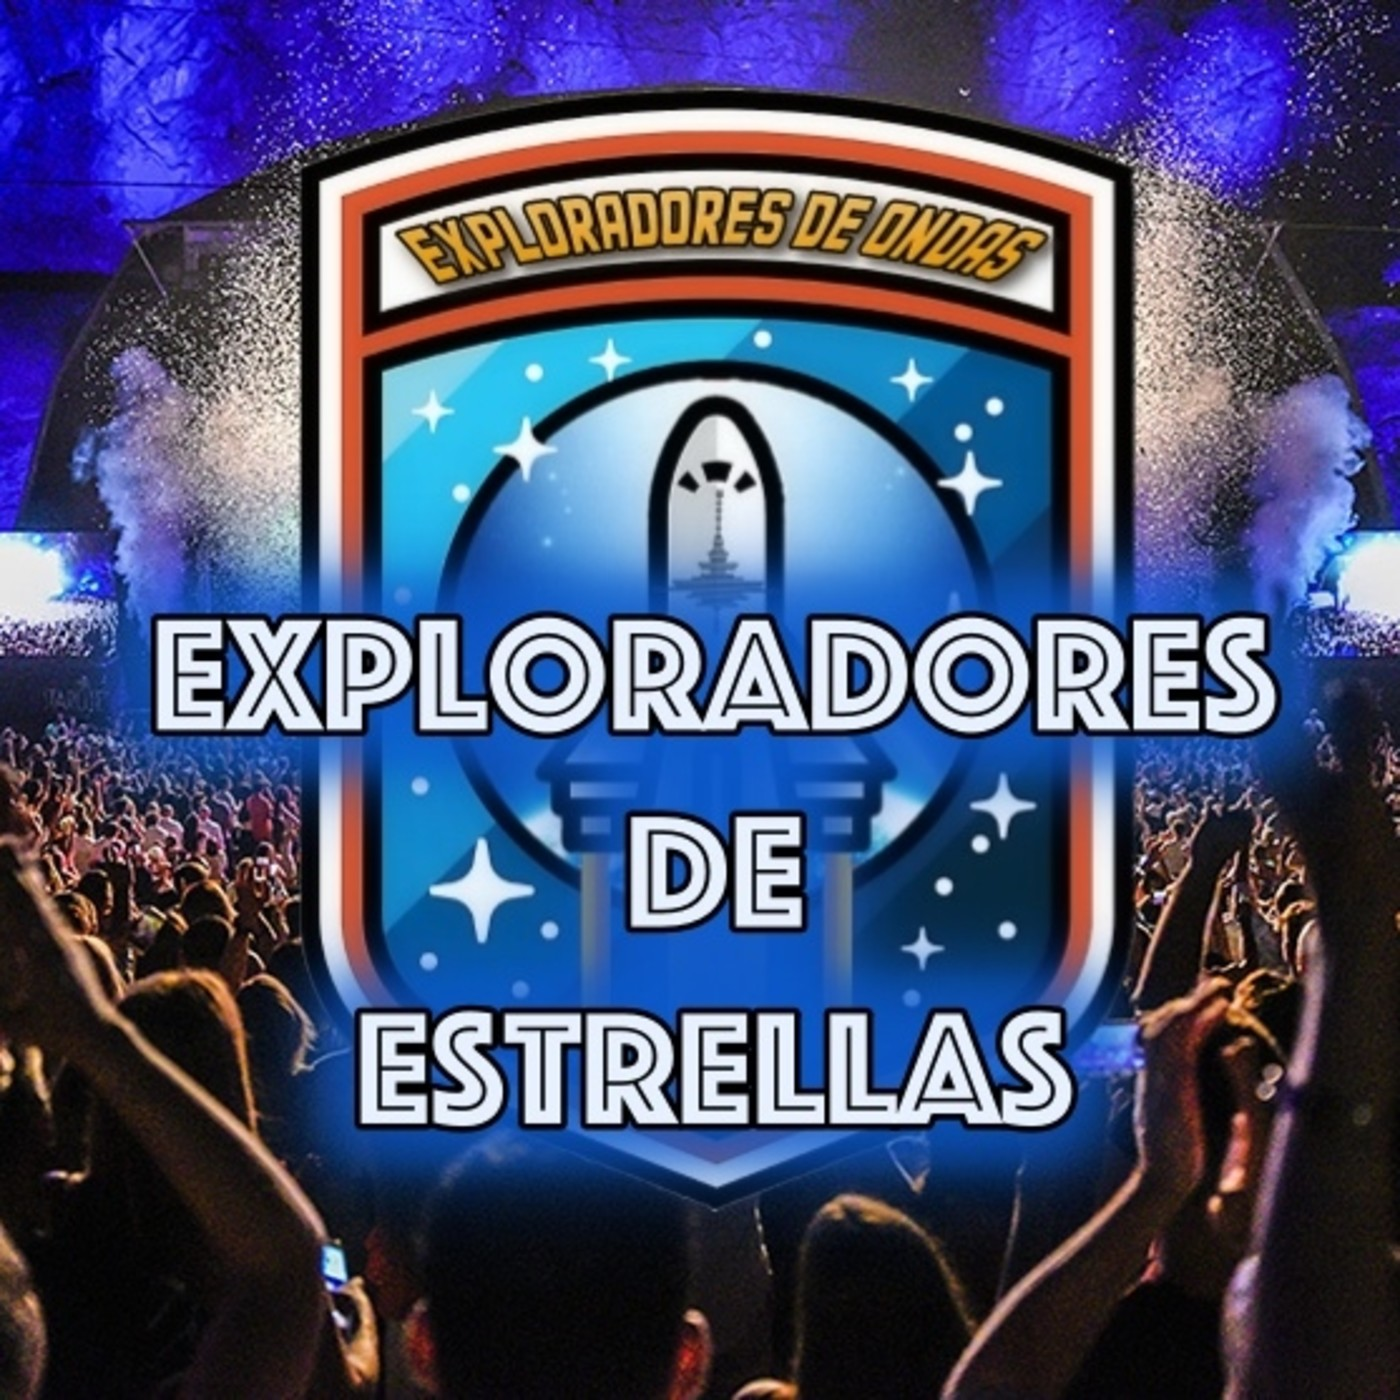 Exploradores de Estrellas #1 en Exploradores de ondas